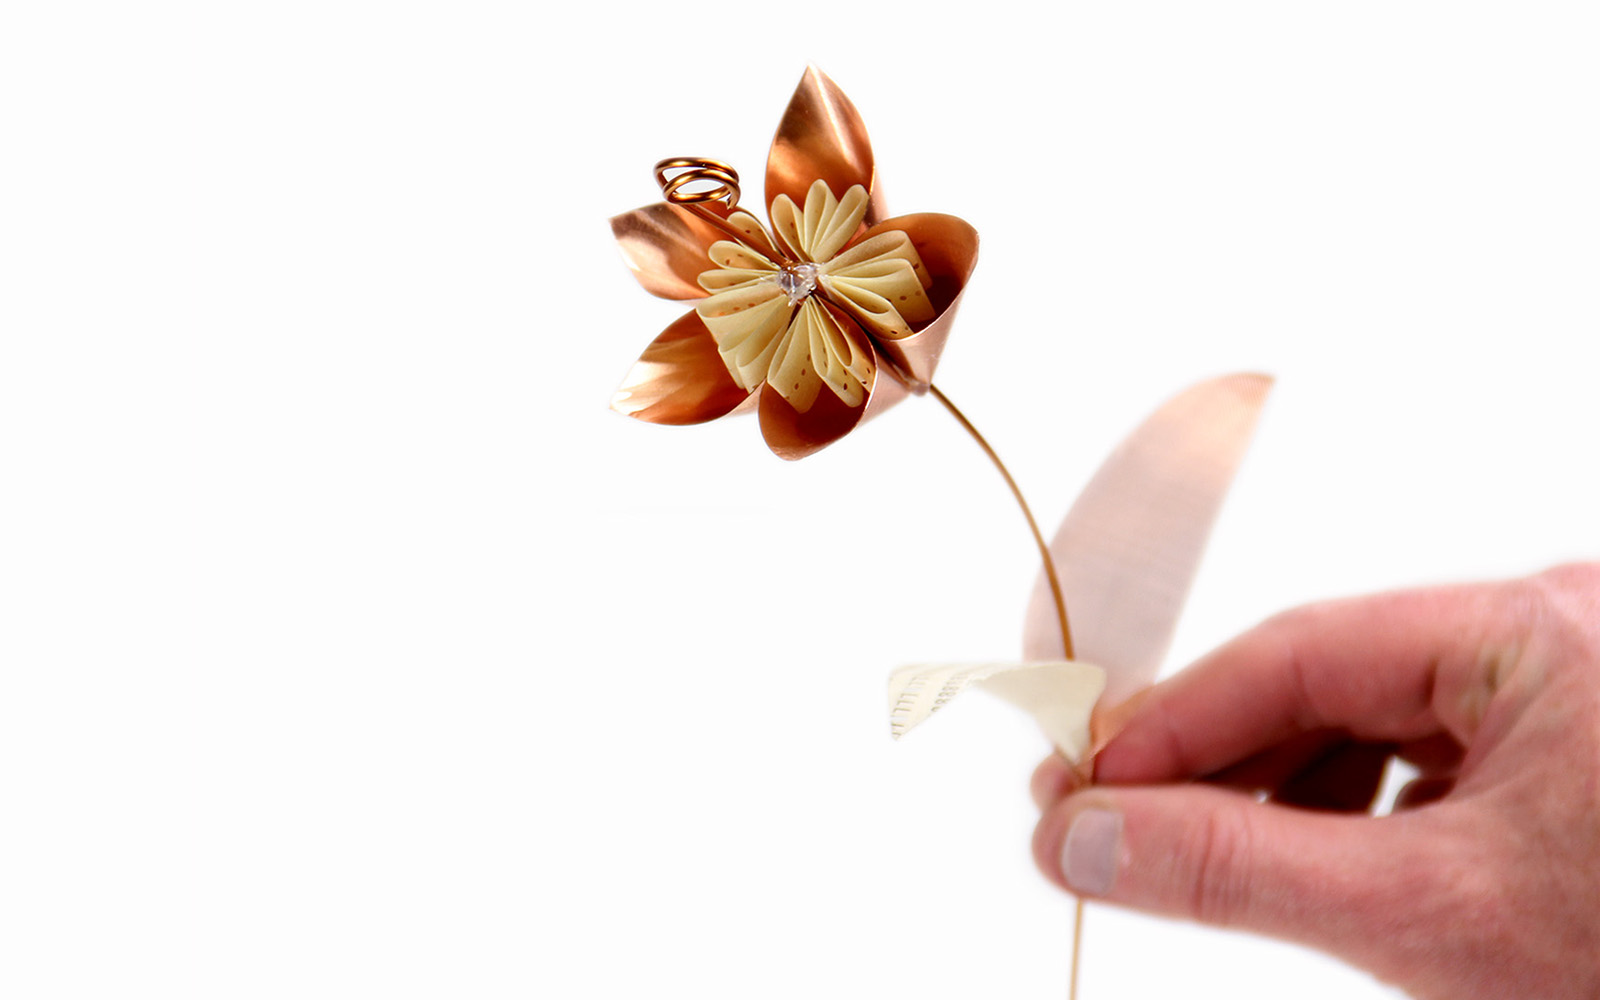 Queen-Bouquet-one-flower